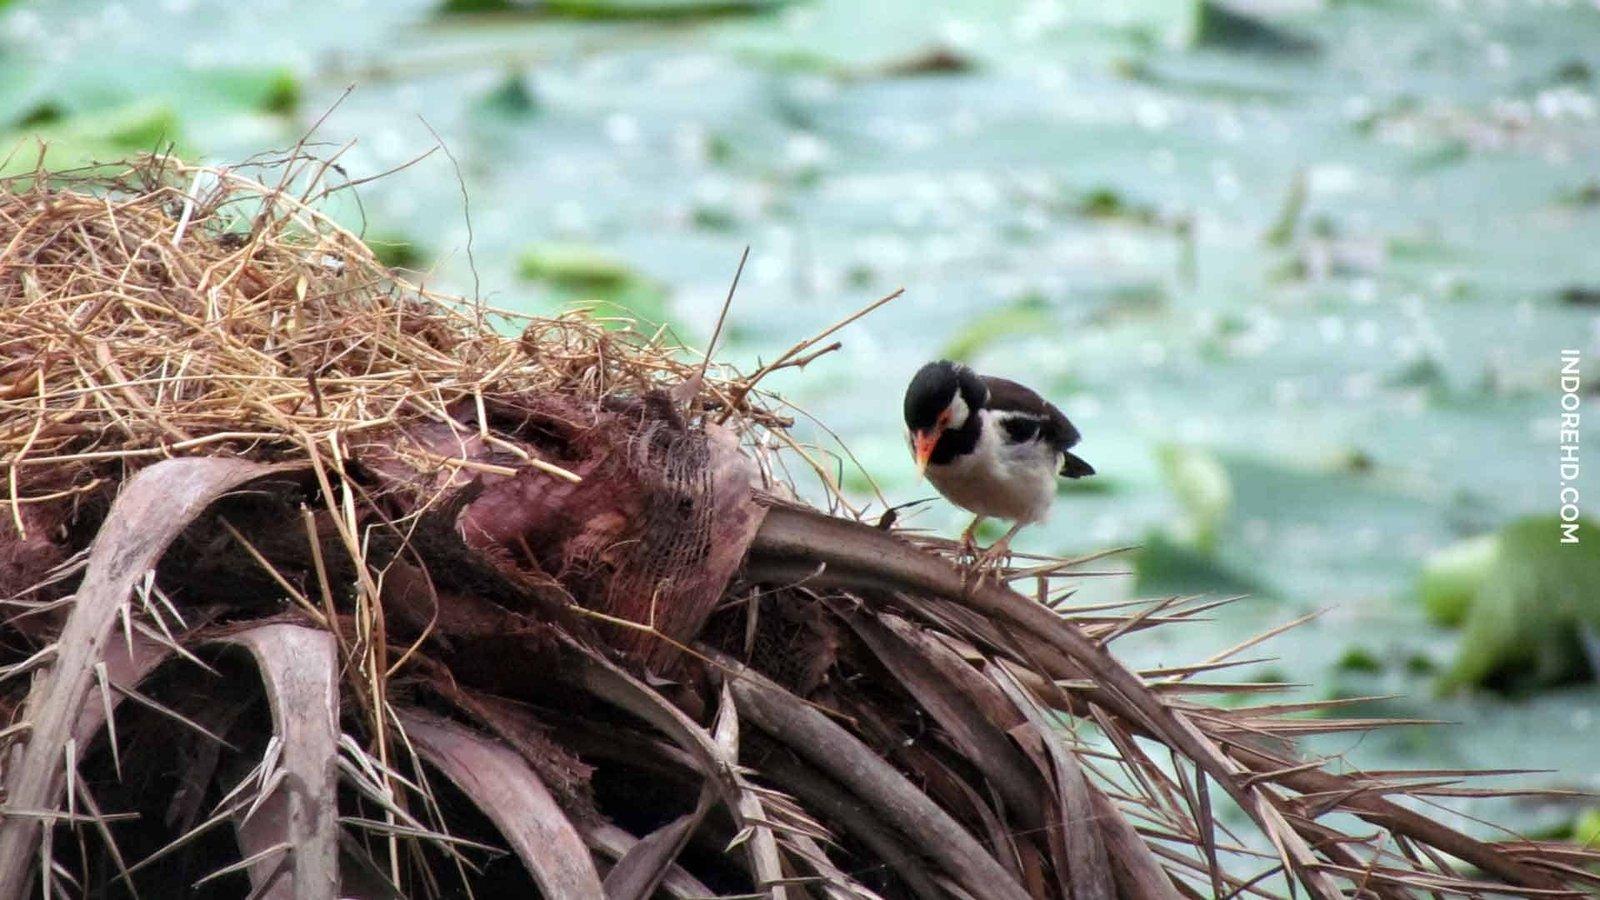 Exotic-species-birds-sirpur-lake-Indore-IndoreHD-featured